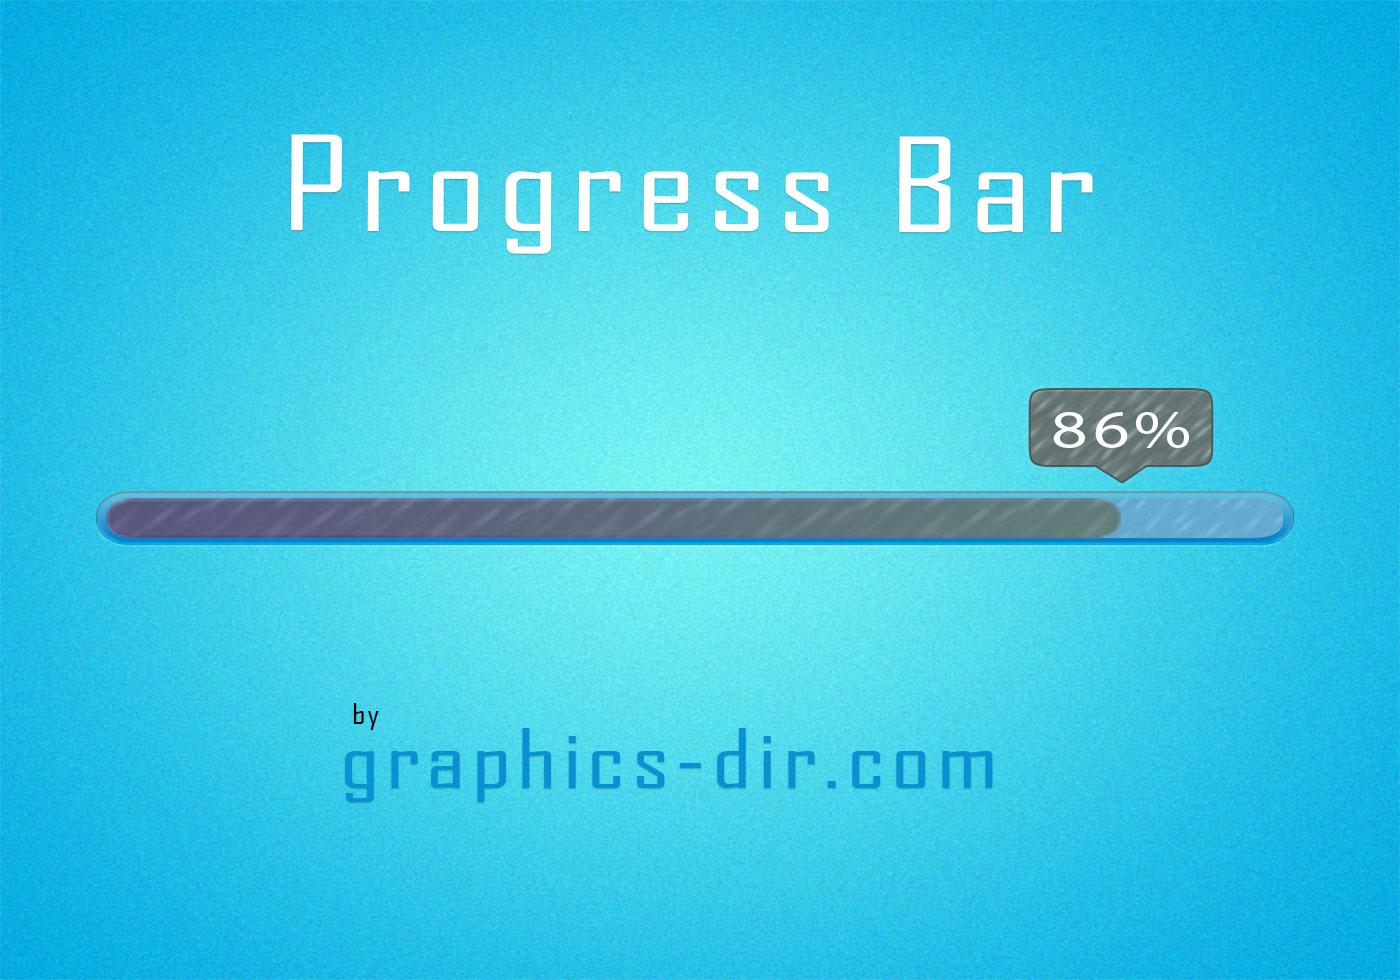 PSD Progress Bar Free Photoshop PSDs At Brusheezy